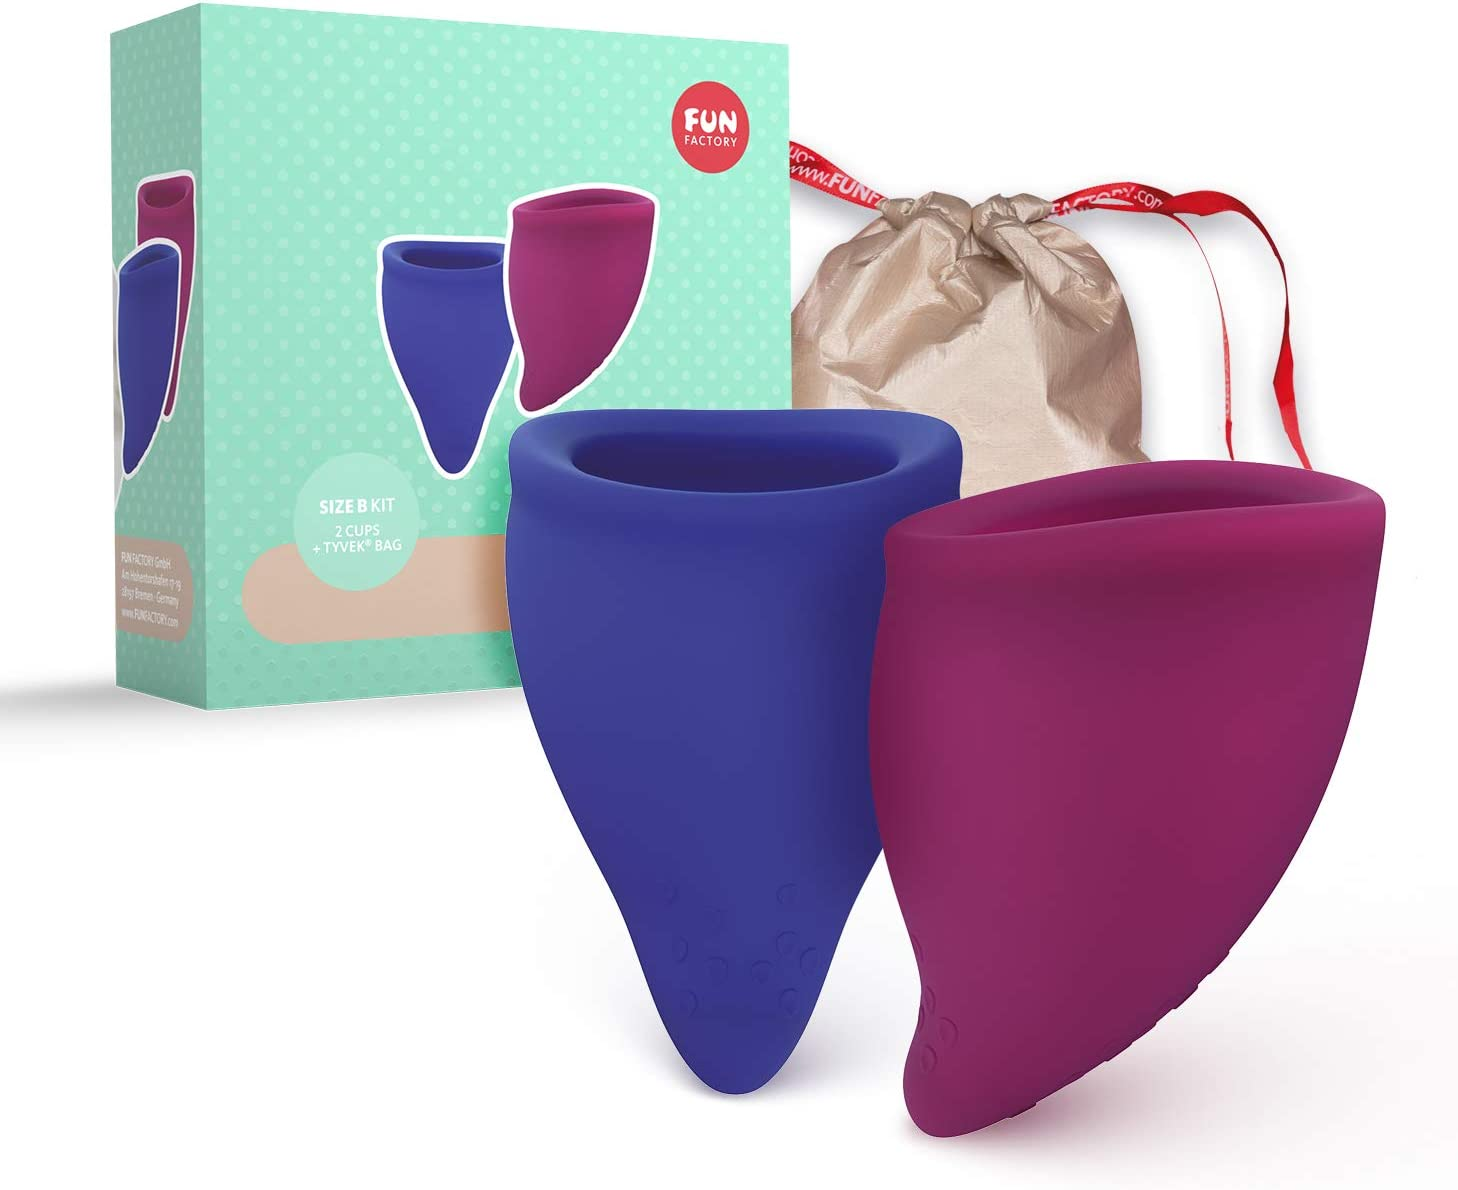 Fun Factory FUN CUP - Copa menstrual talla B silicona medica ...